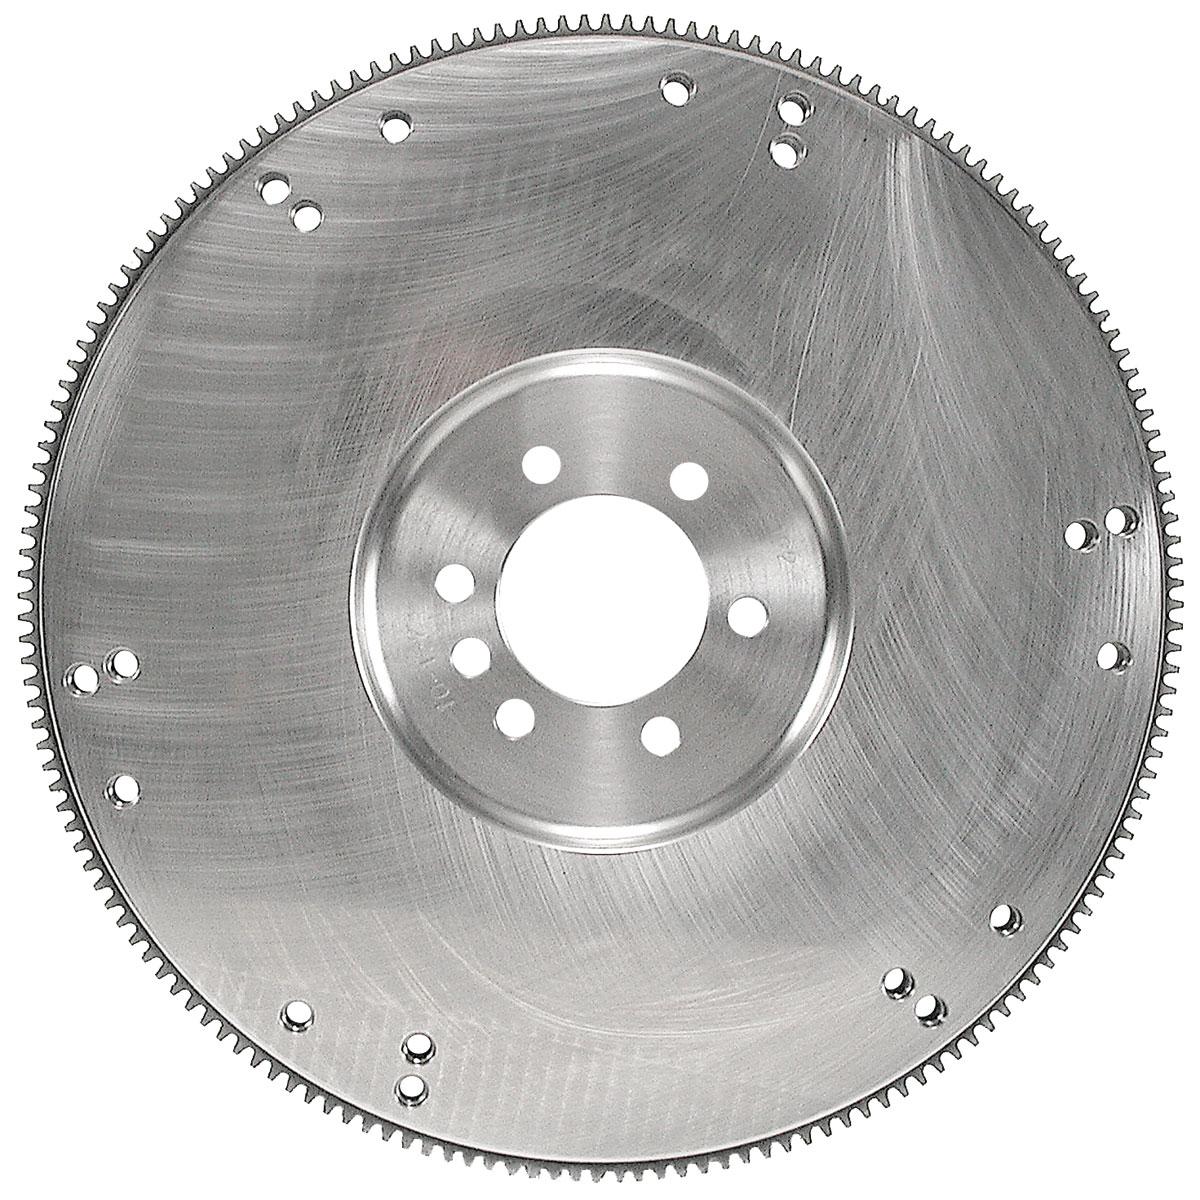 Photo of Flywheels, Billet Steel, Hays 168 Tooth 30lb., 400, ext. bal.